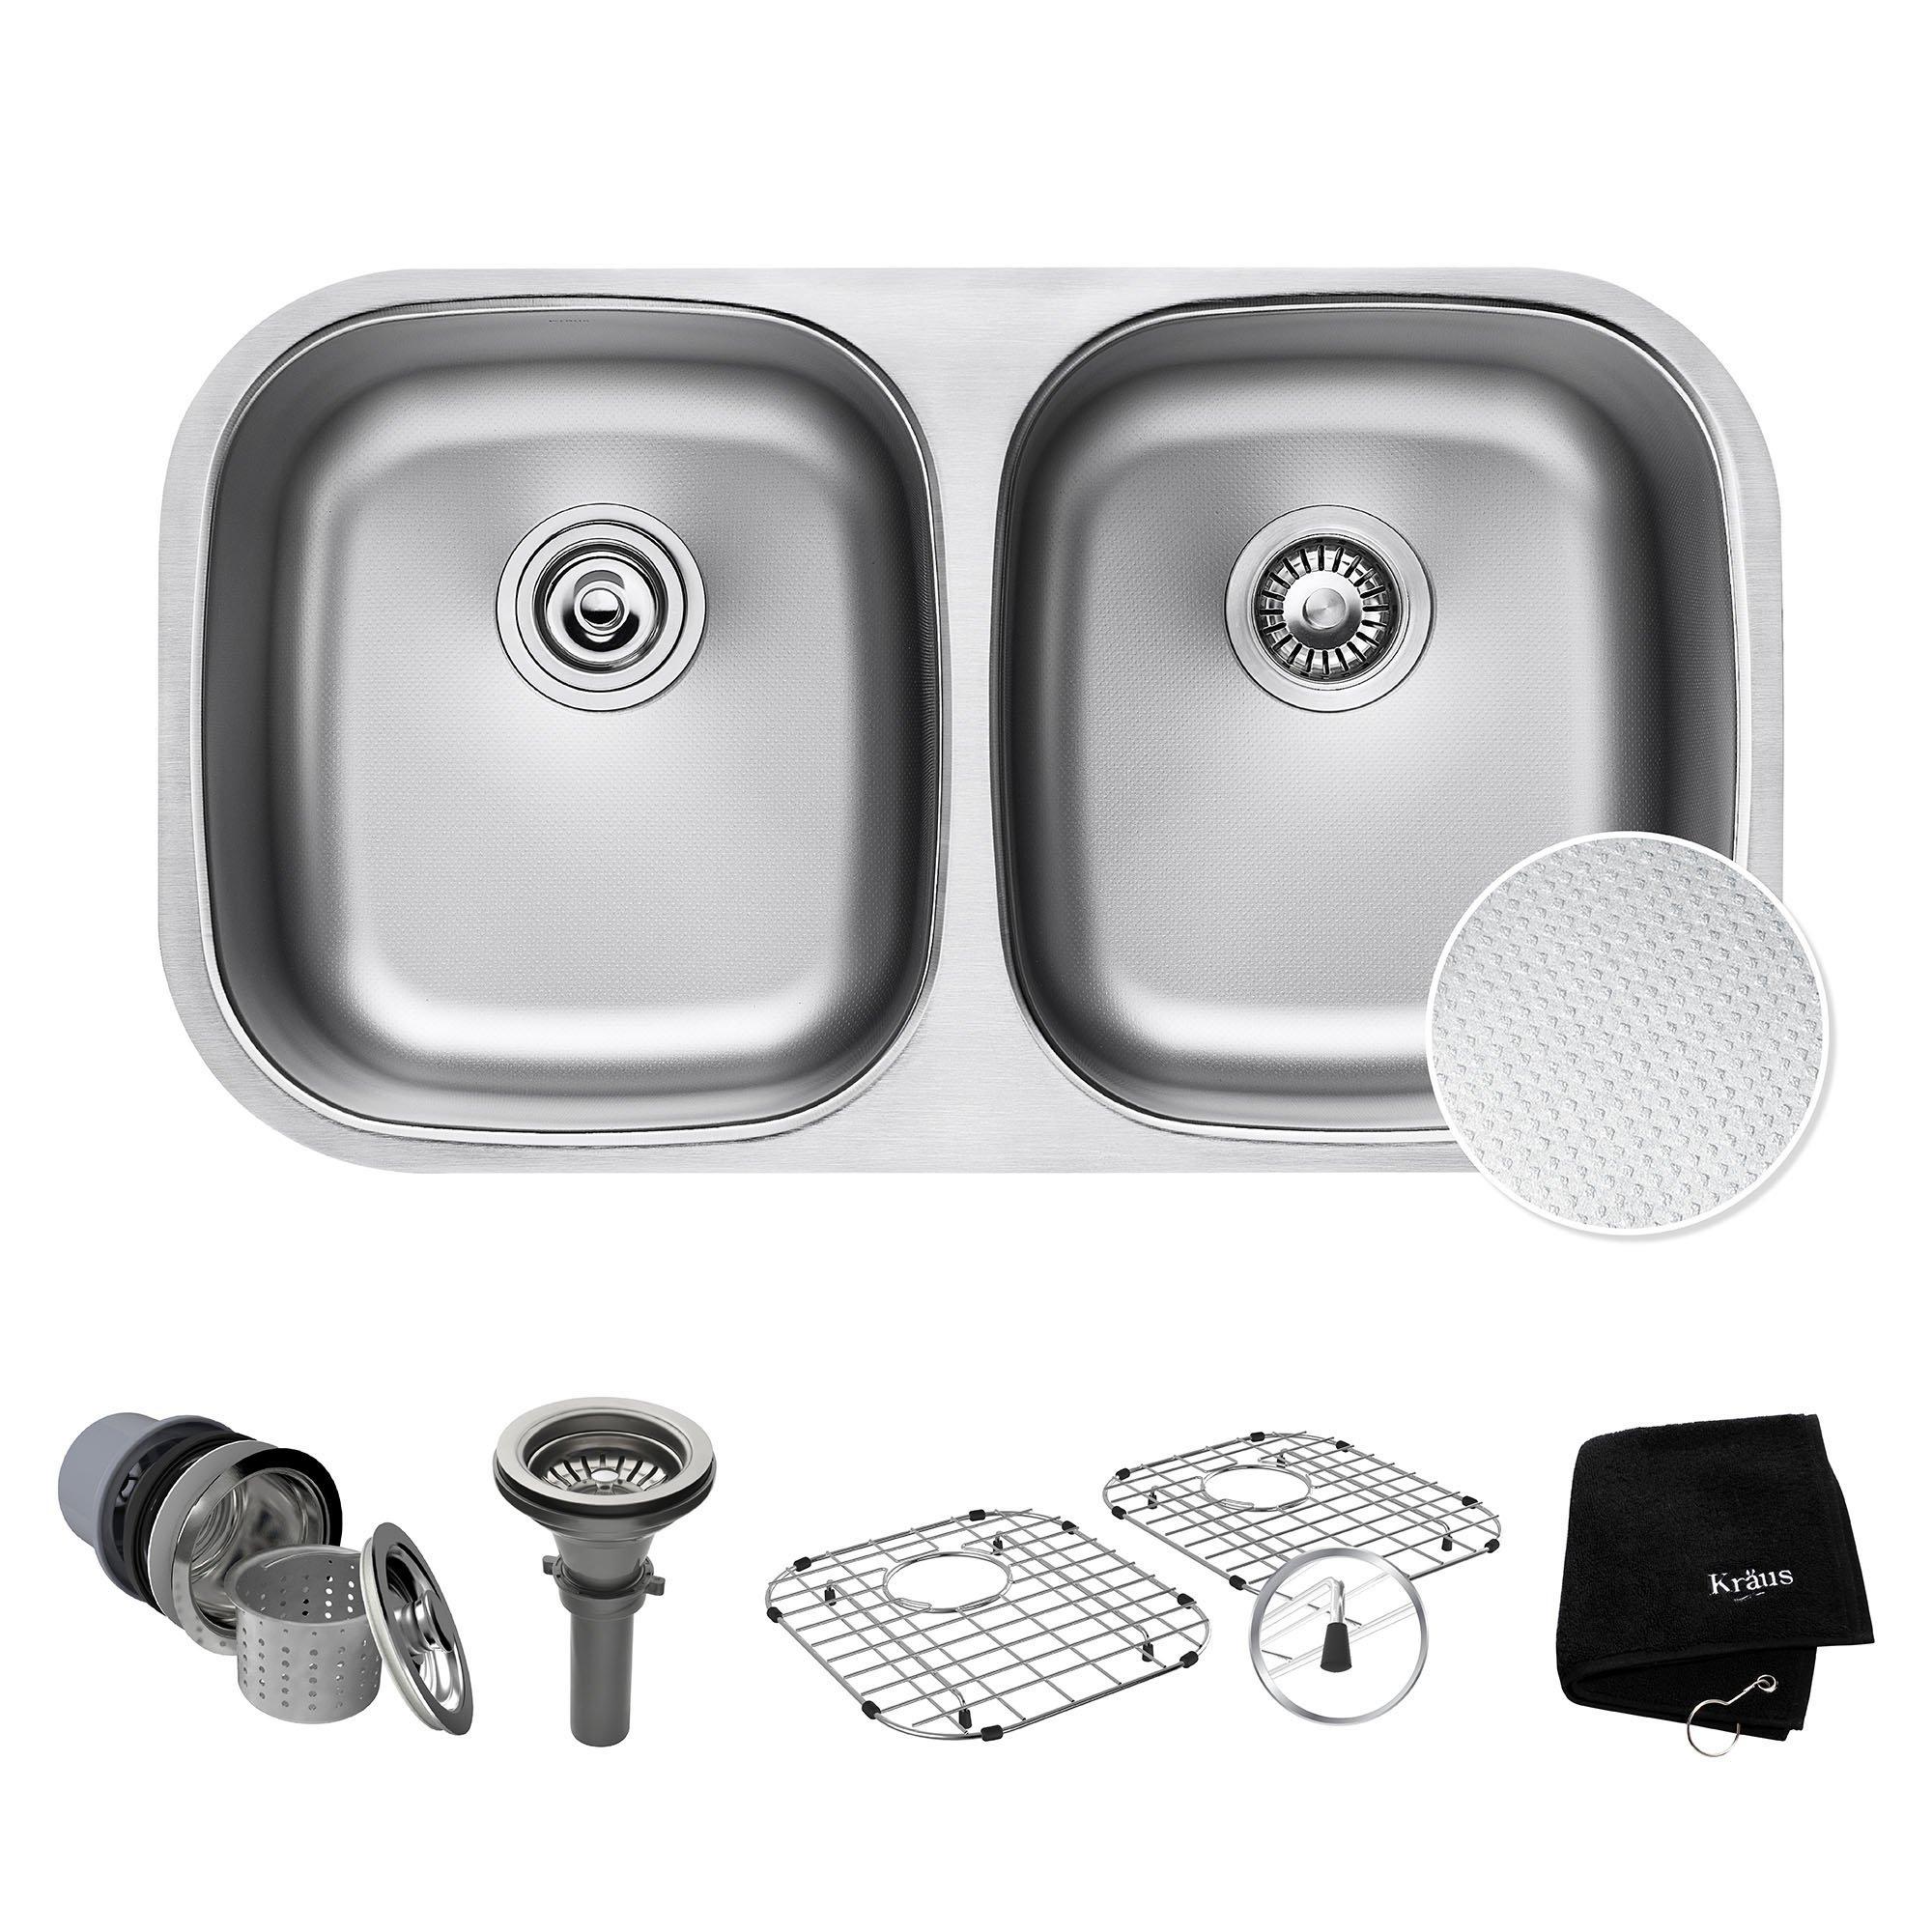 Kraus Outlast MicroShield Scratch-Resist Stainless Steel Undermount 50/50 Double Bowl Sink, 32'' 16 Gauge, Premier Series KBU22E